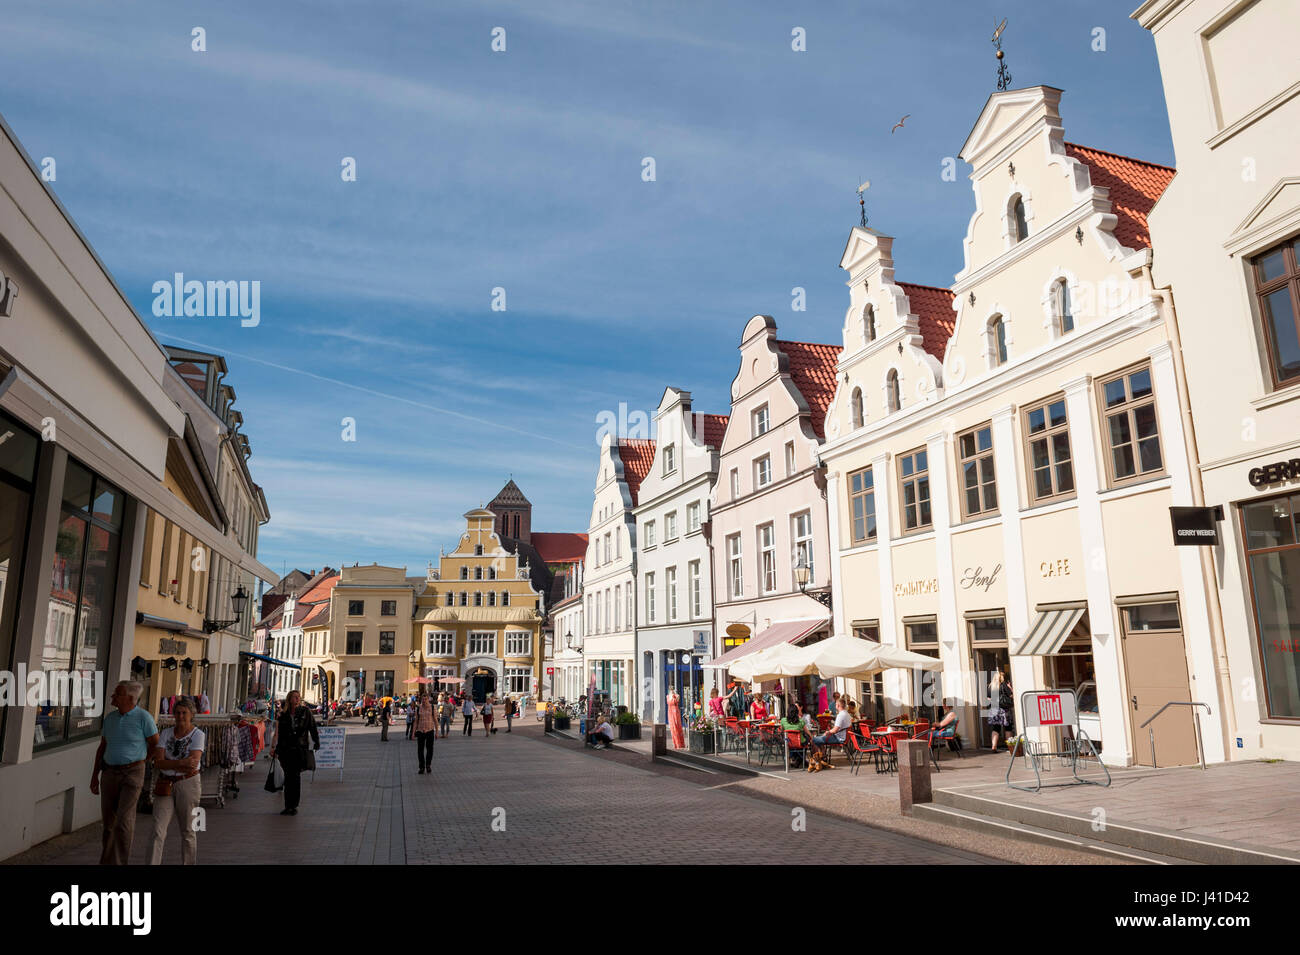 Marketsquare in Wismar, Baltic Sea, Germany, Europe - Stock Image